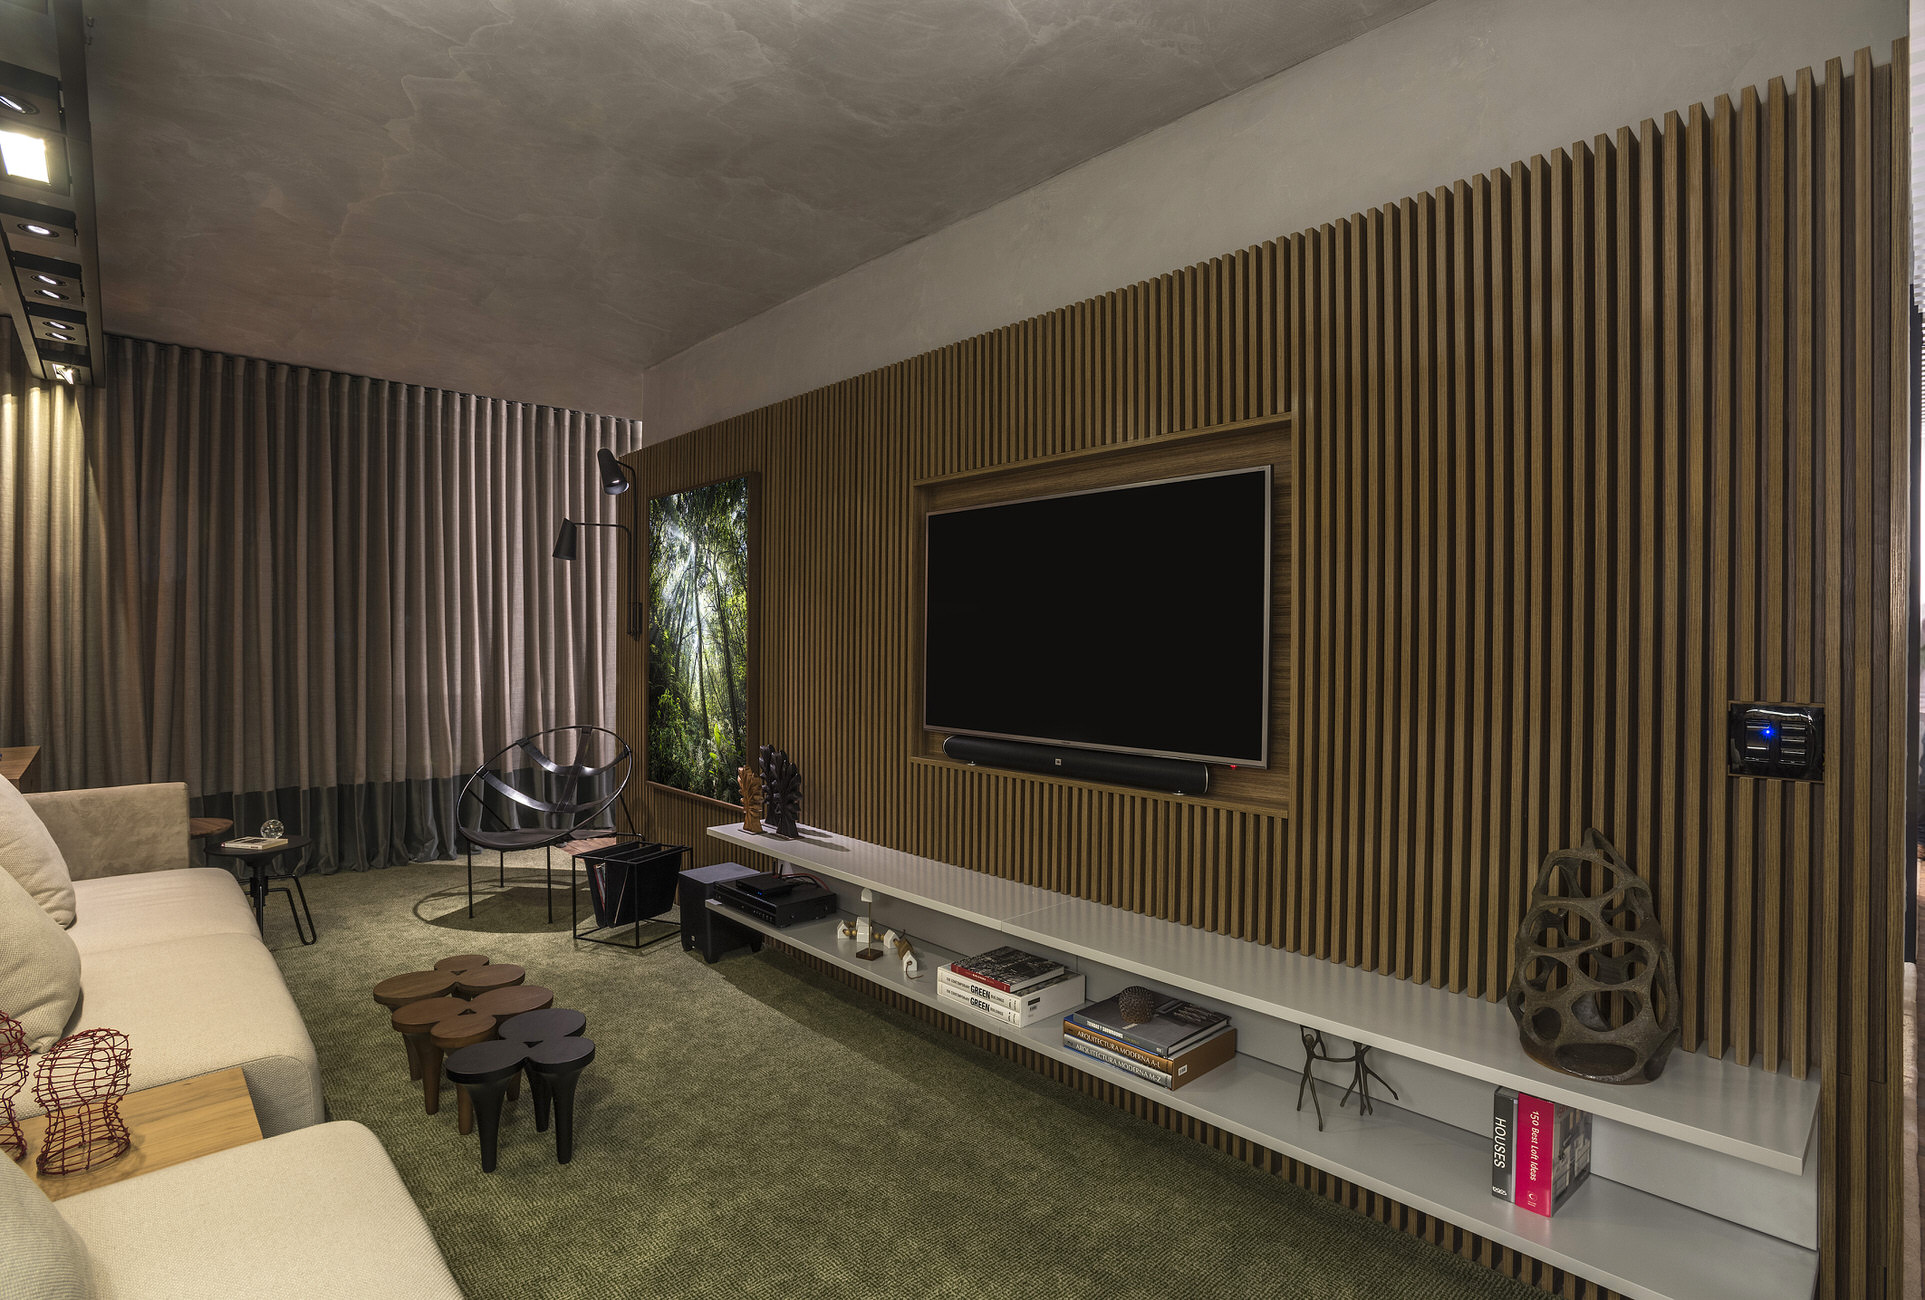 Situar-Projetos-CC2016c-Home